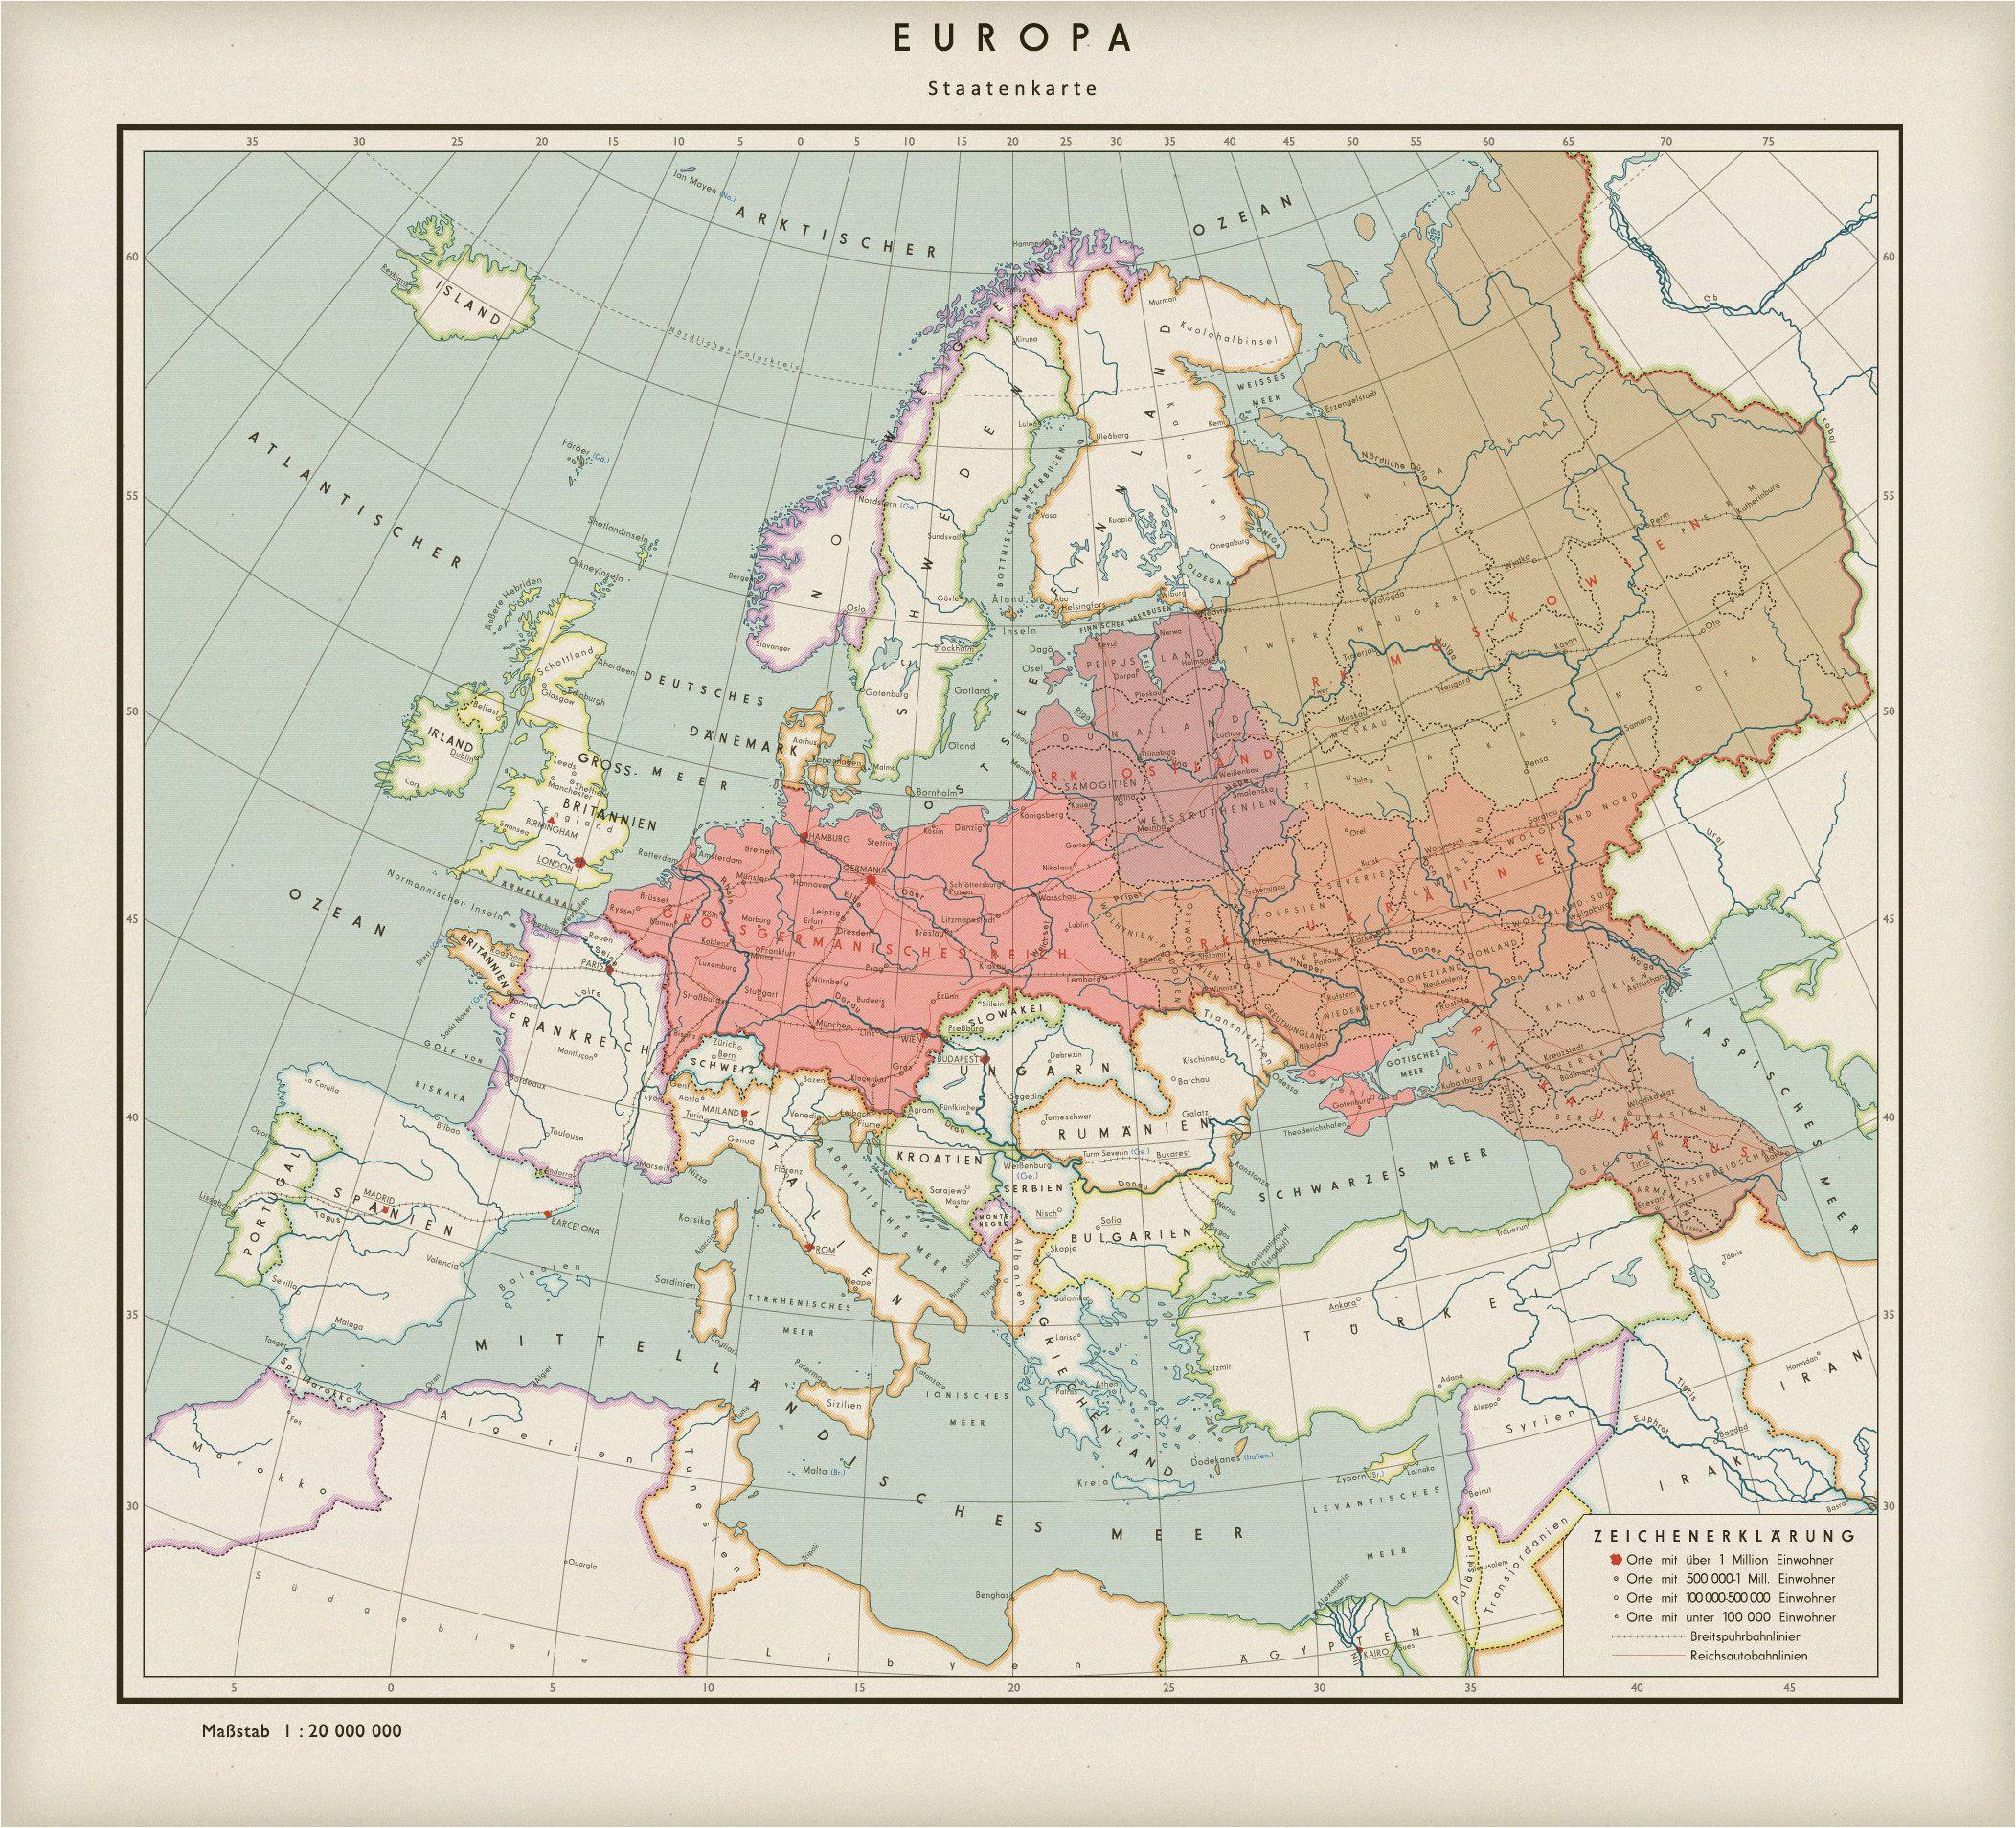 puppet vs annex historical curiosities map imaginary